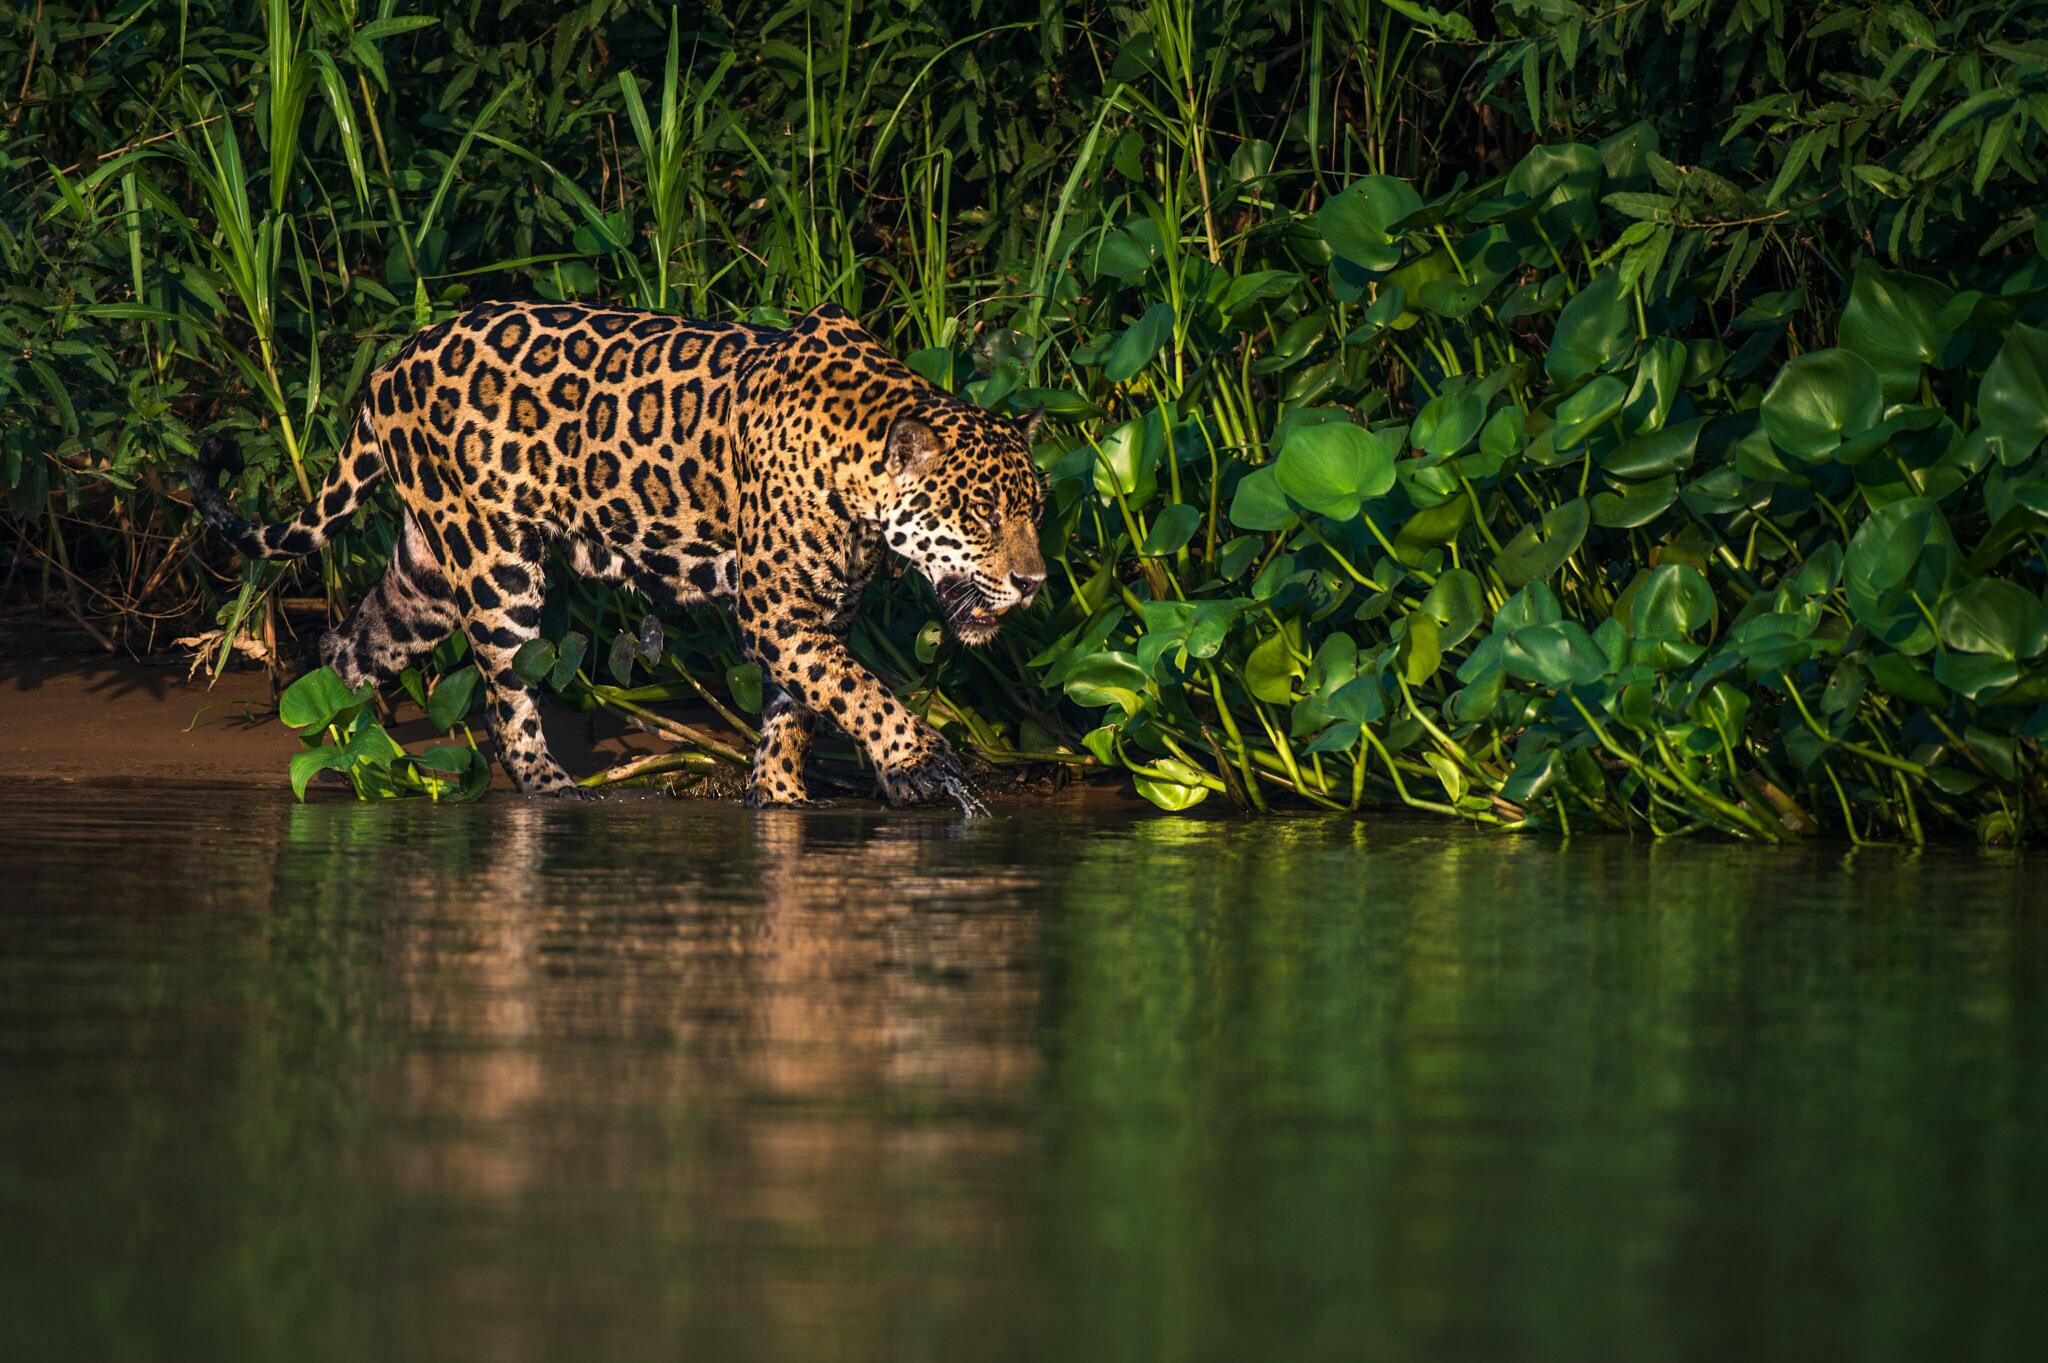 Roos Jaguar